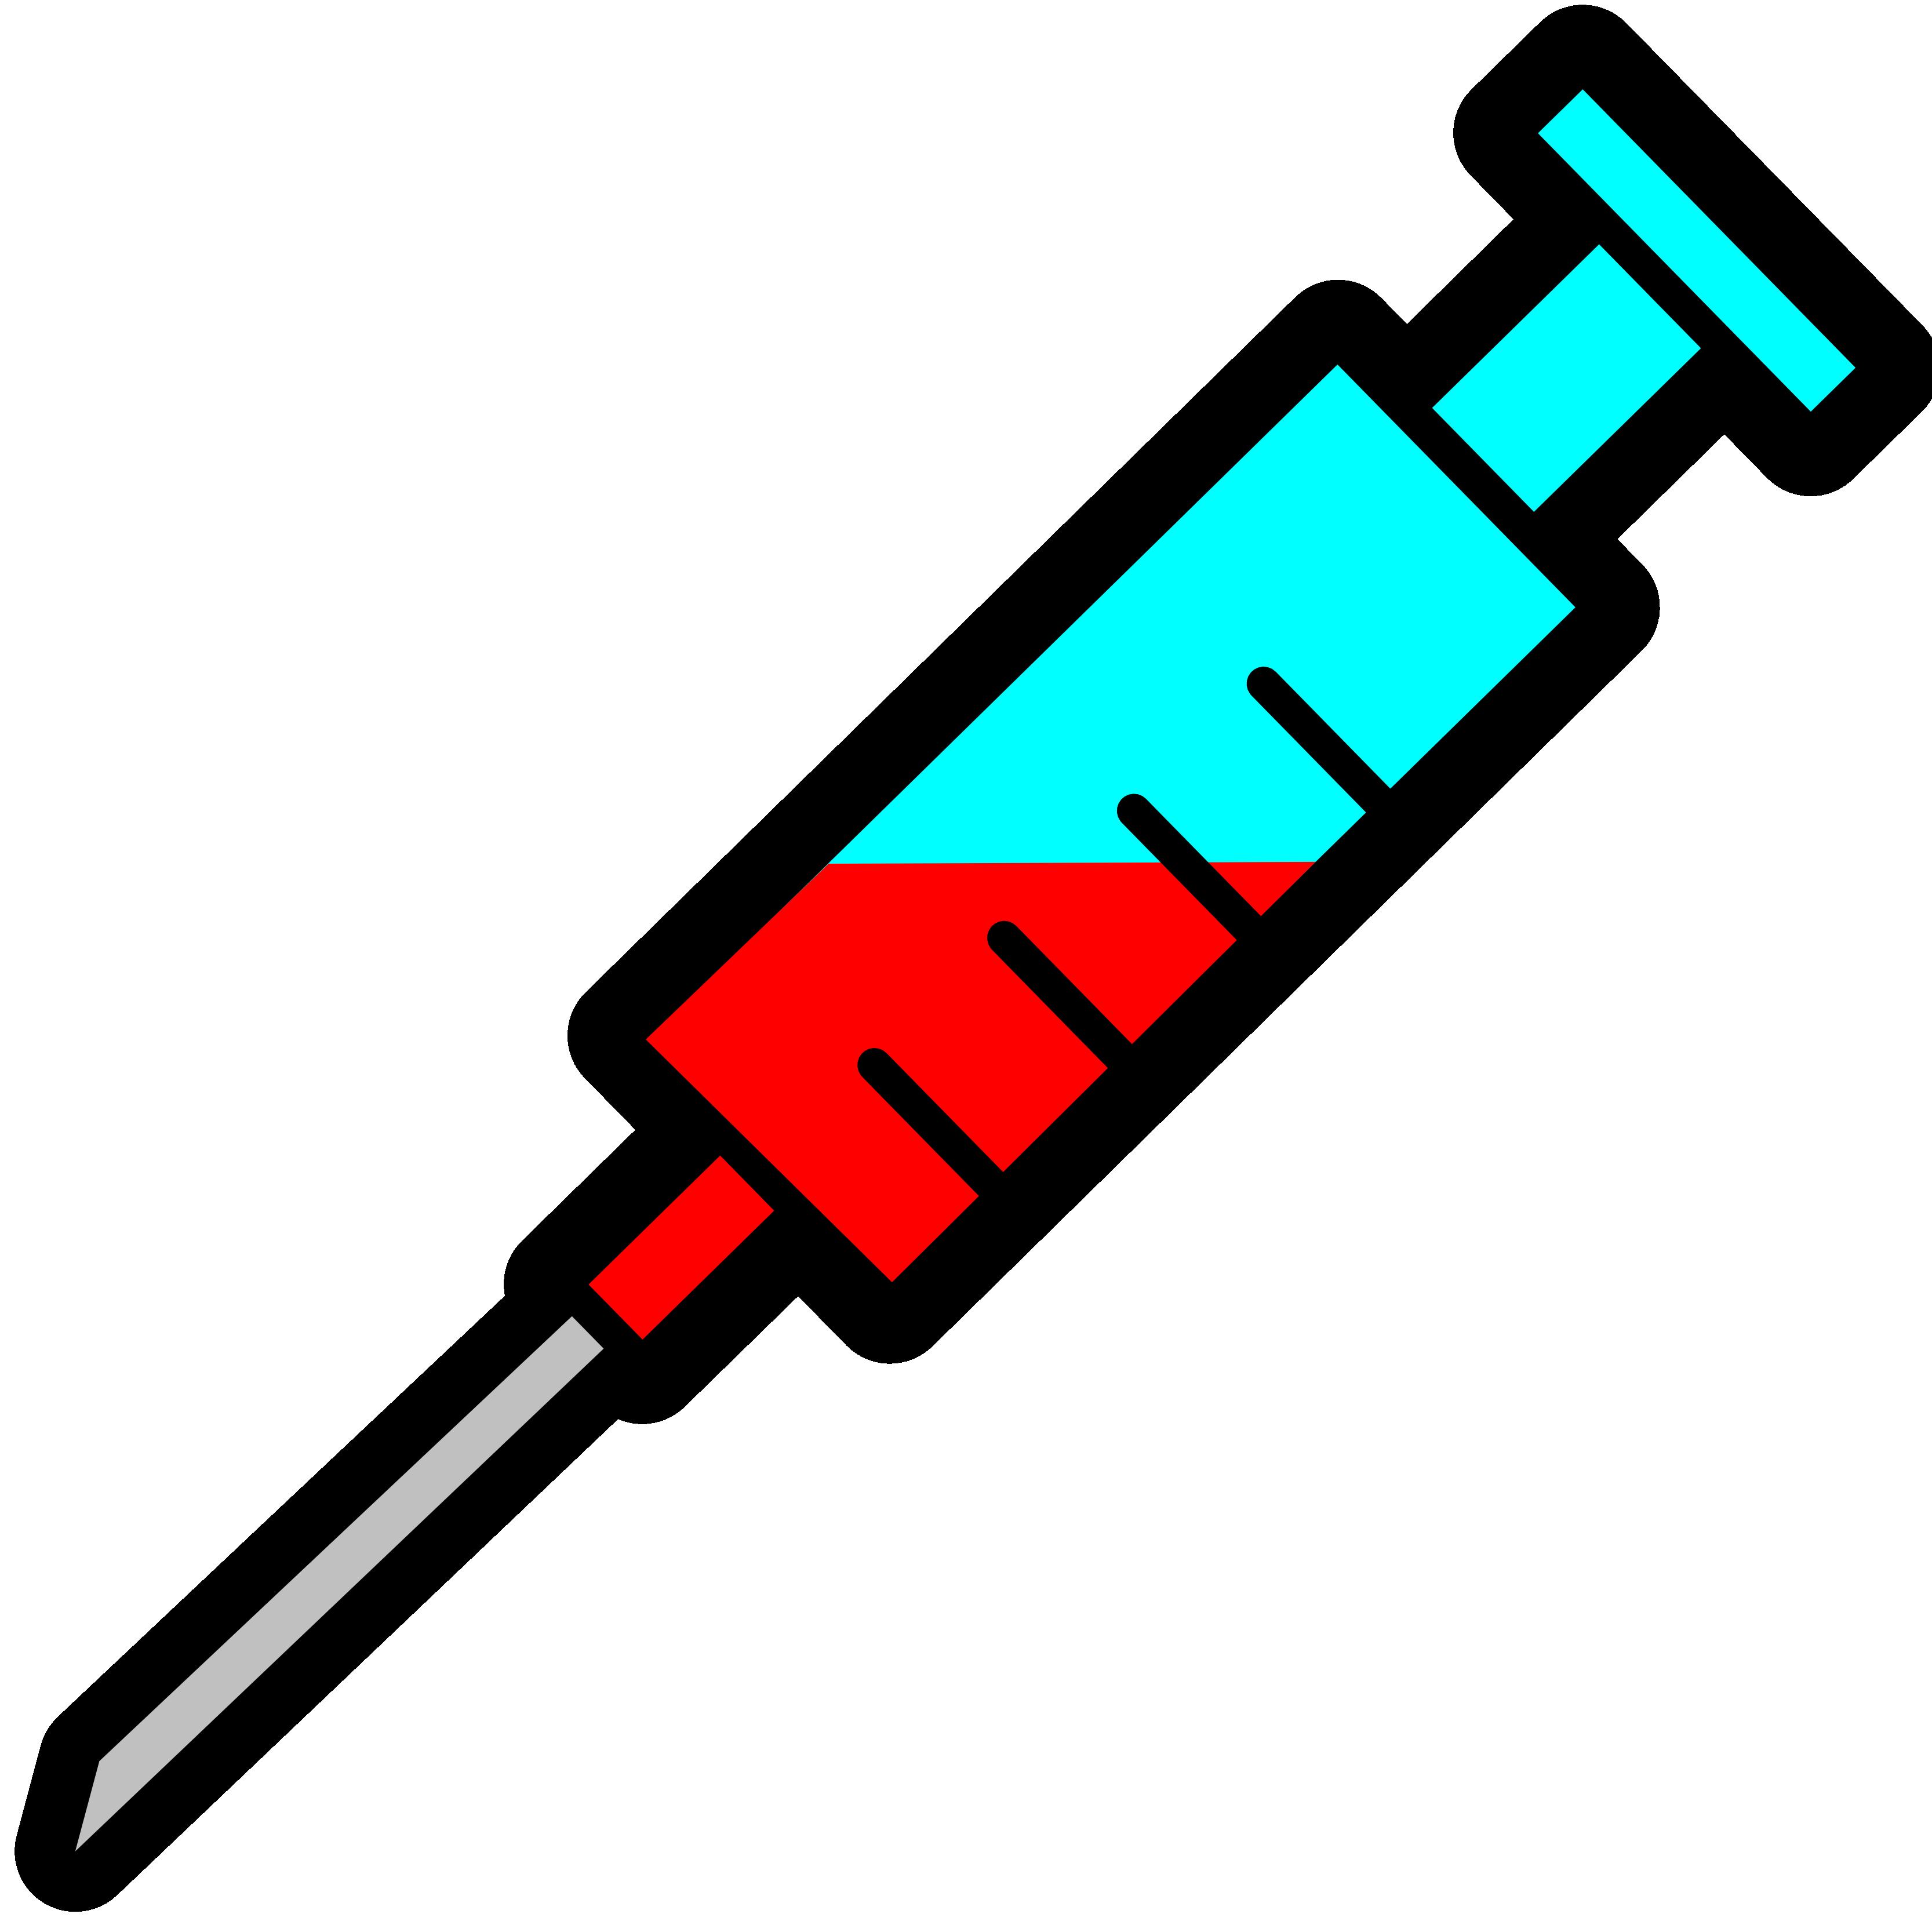 freeuse library Clip art panda free. Syringe clipart